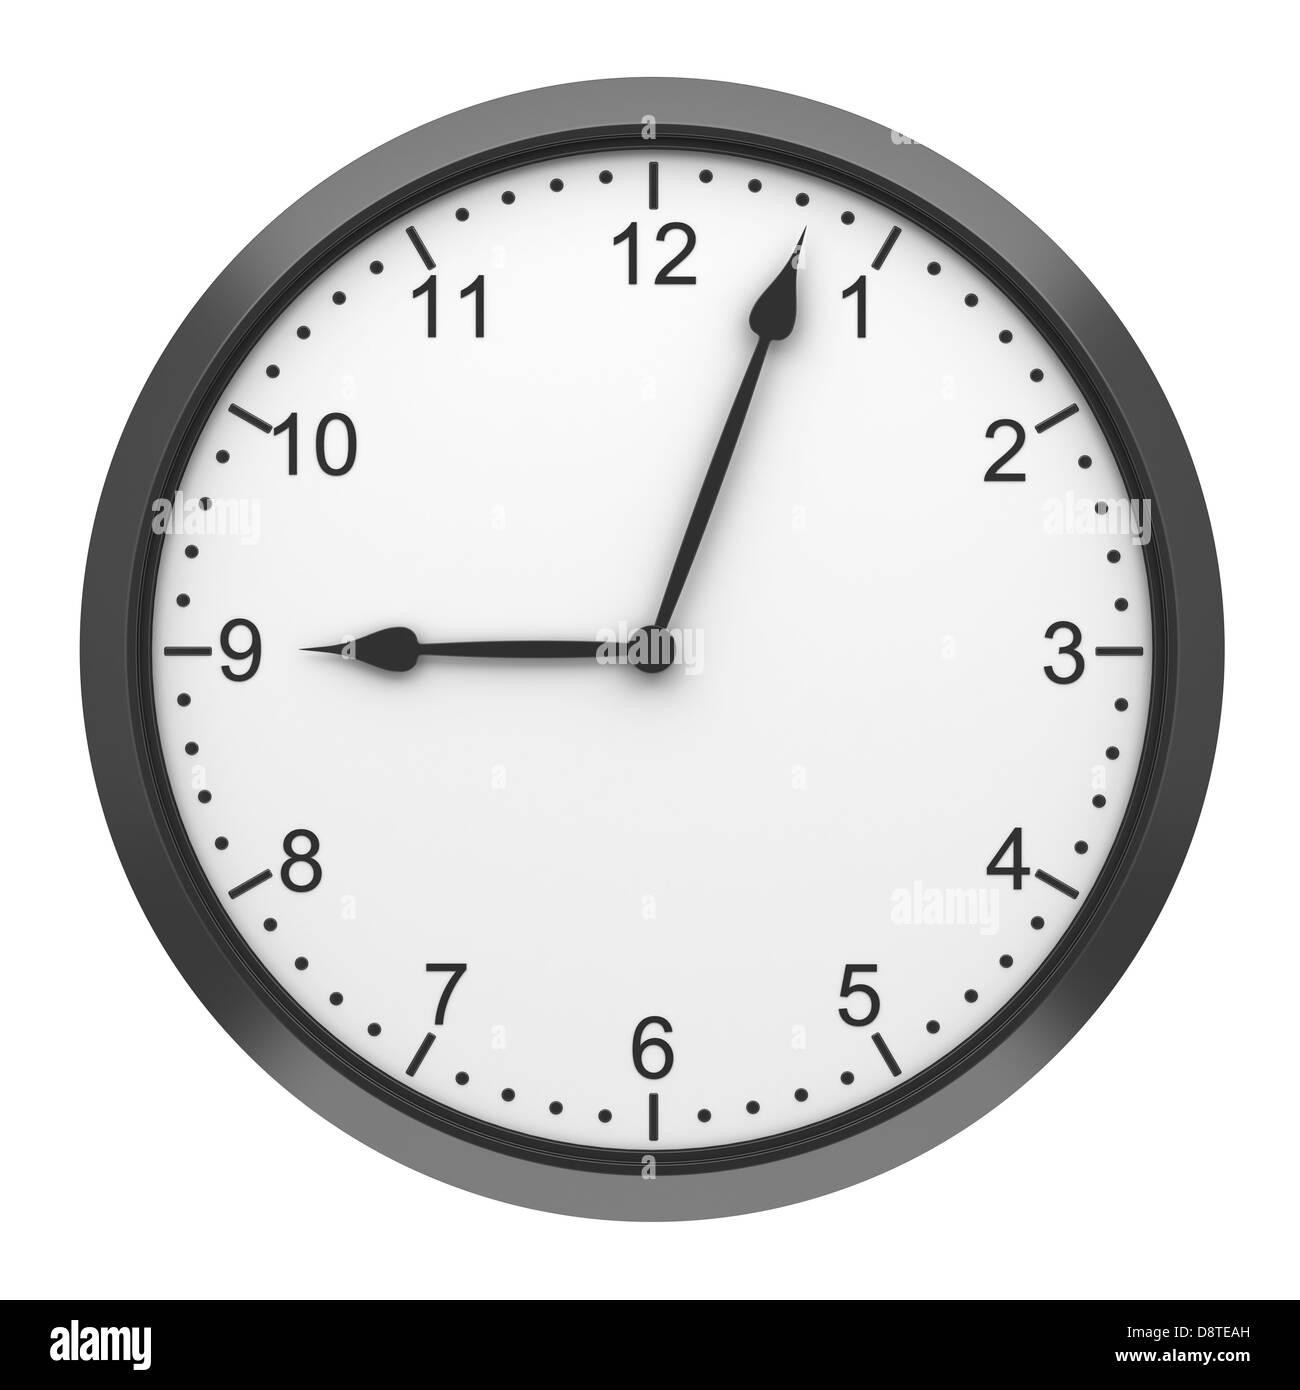 Reloj de pared redondo negro aislado en blanco Imagen De Stock